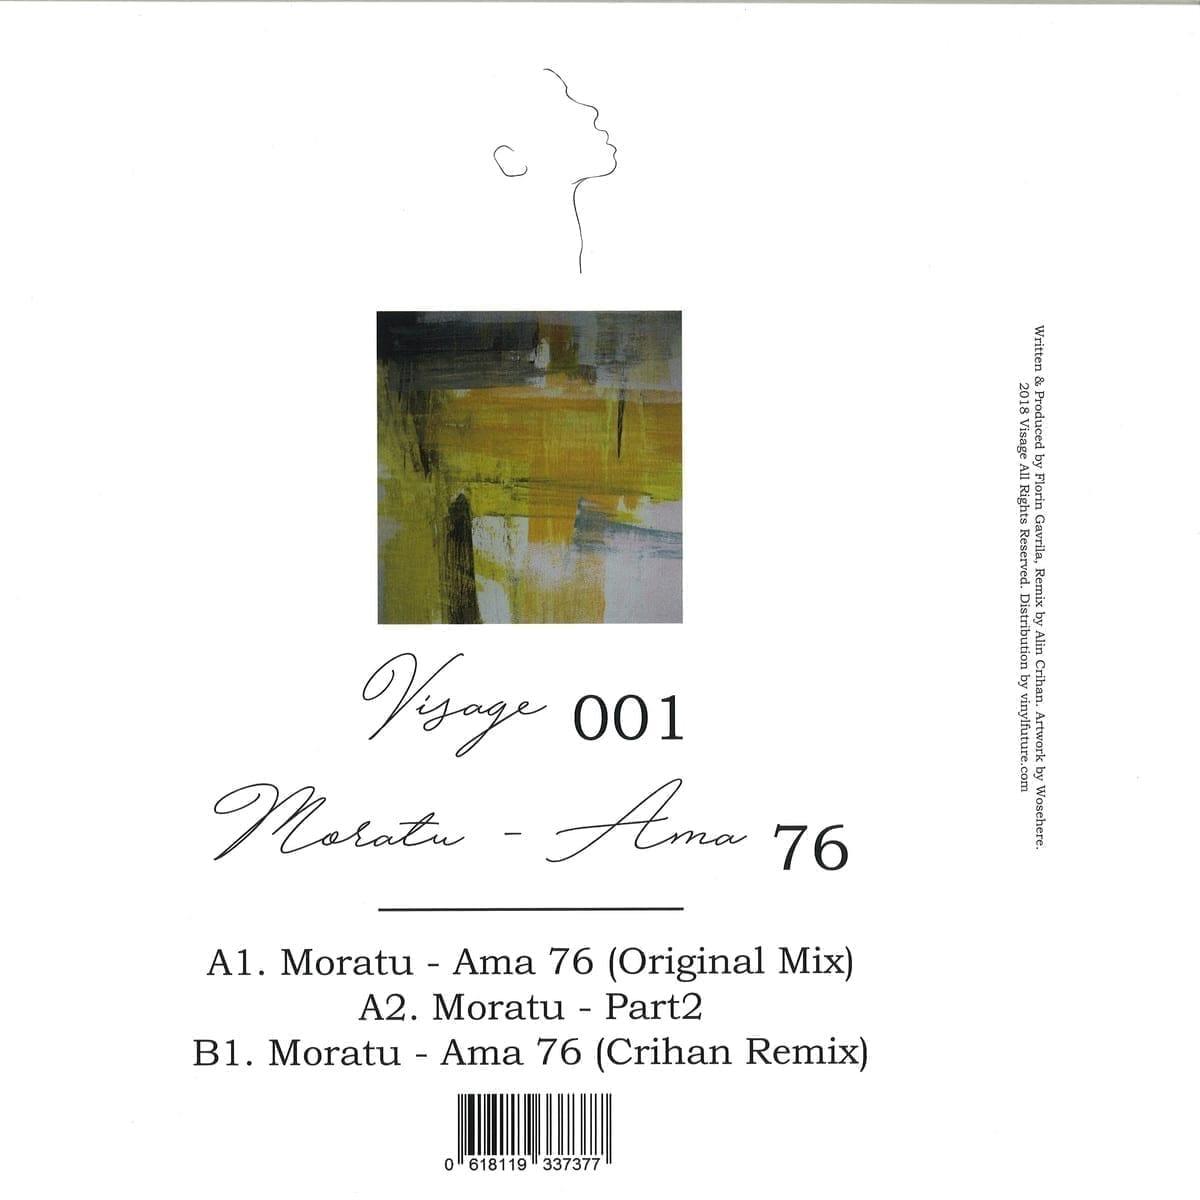 moratu - ama 76 ep [visage ltd] back